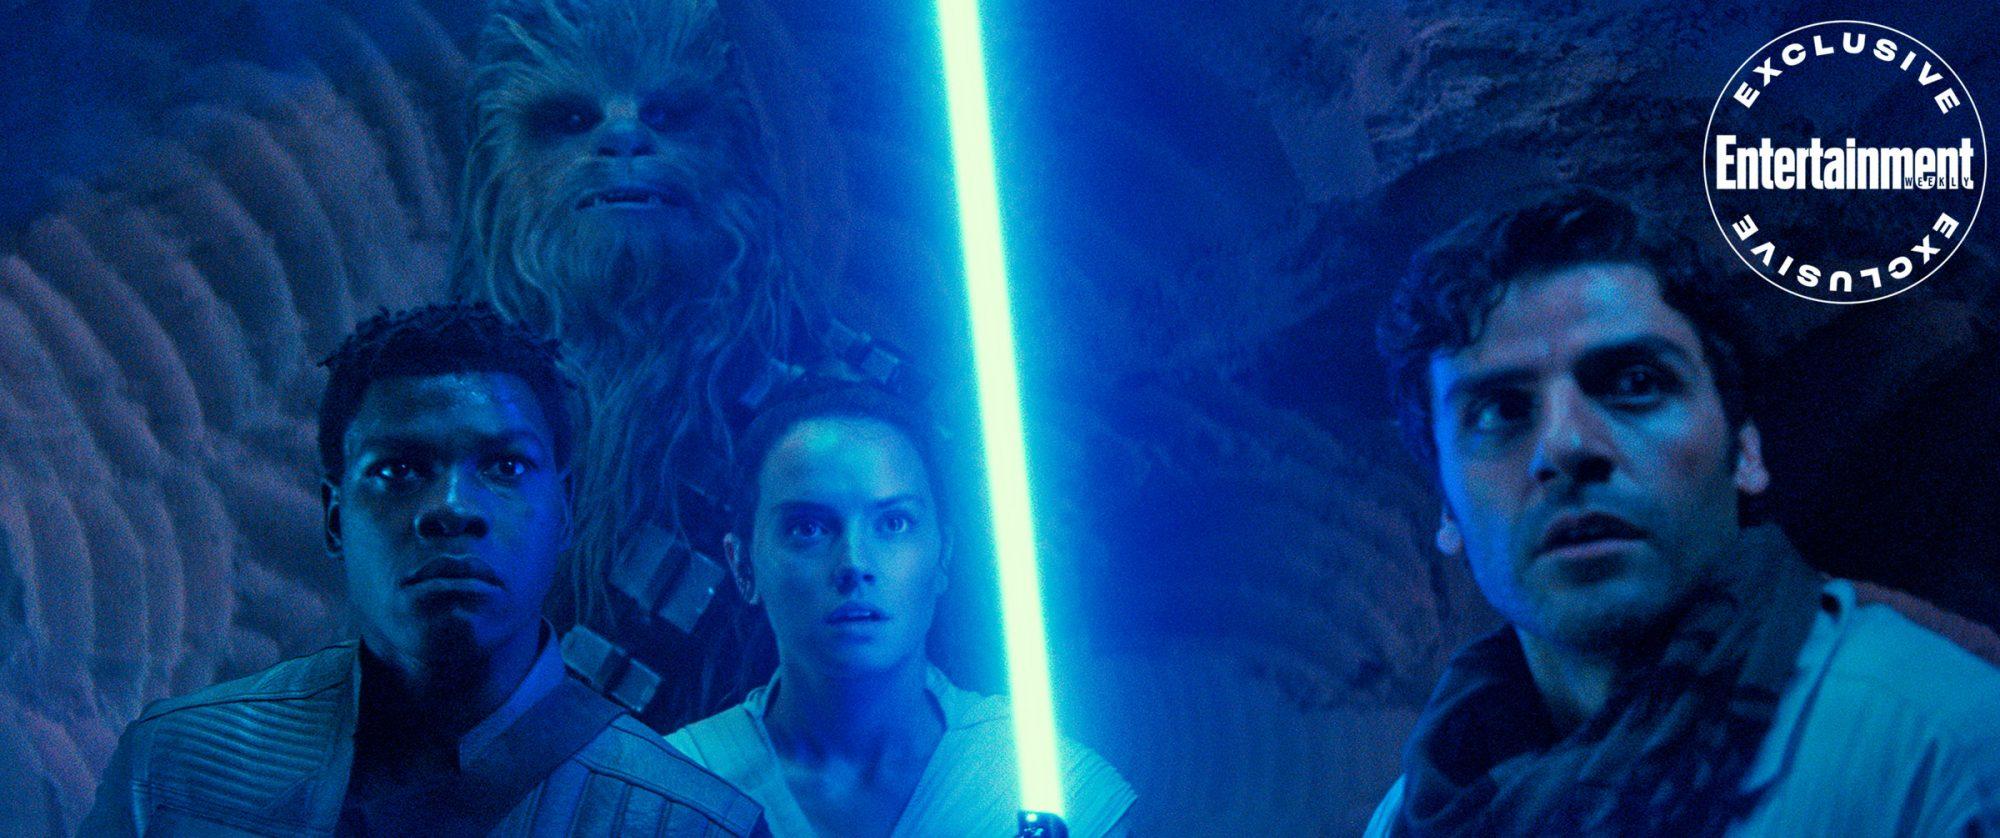 Daisy Ridley Breaks Silence On Star Wars Rise Of Skywalker Criticism Ew Com